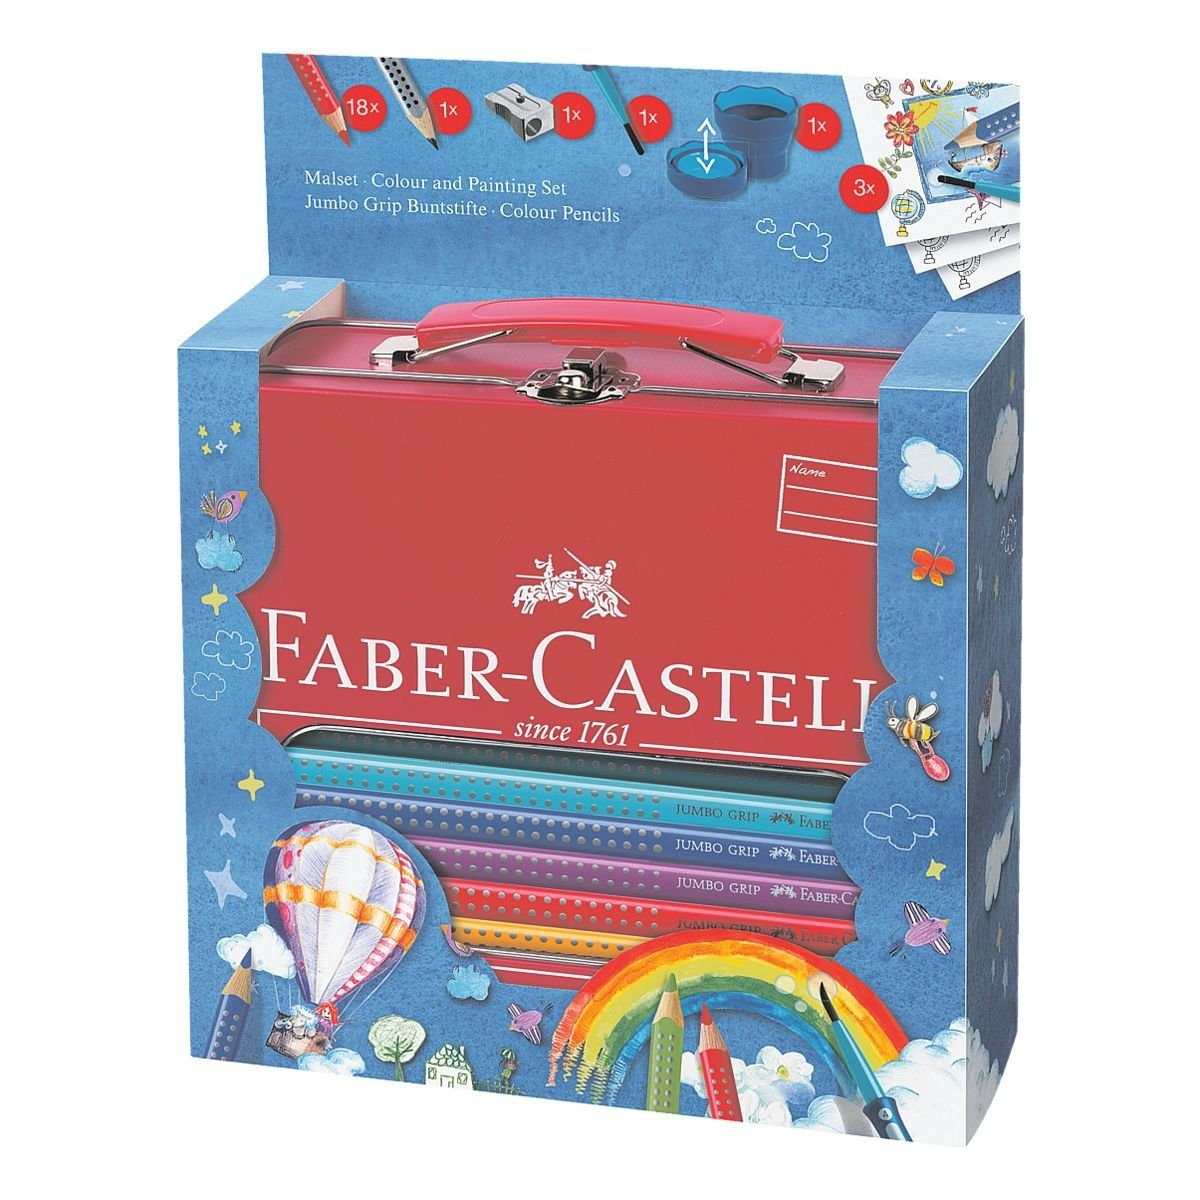 Faber Castell Malset-Box »Jumbo GRIP«